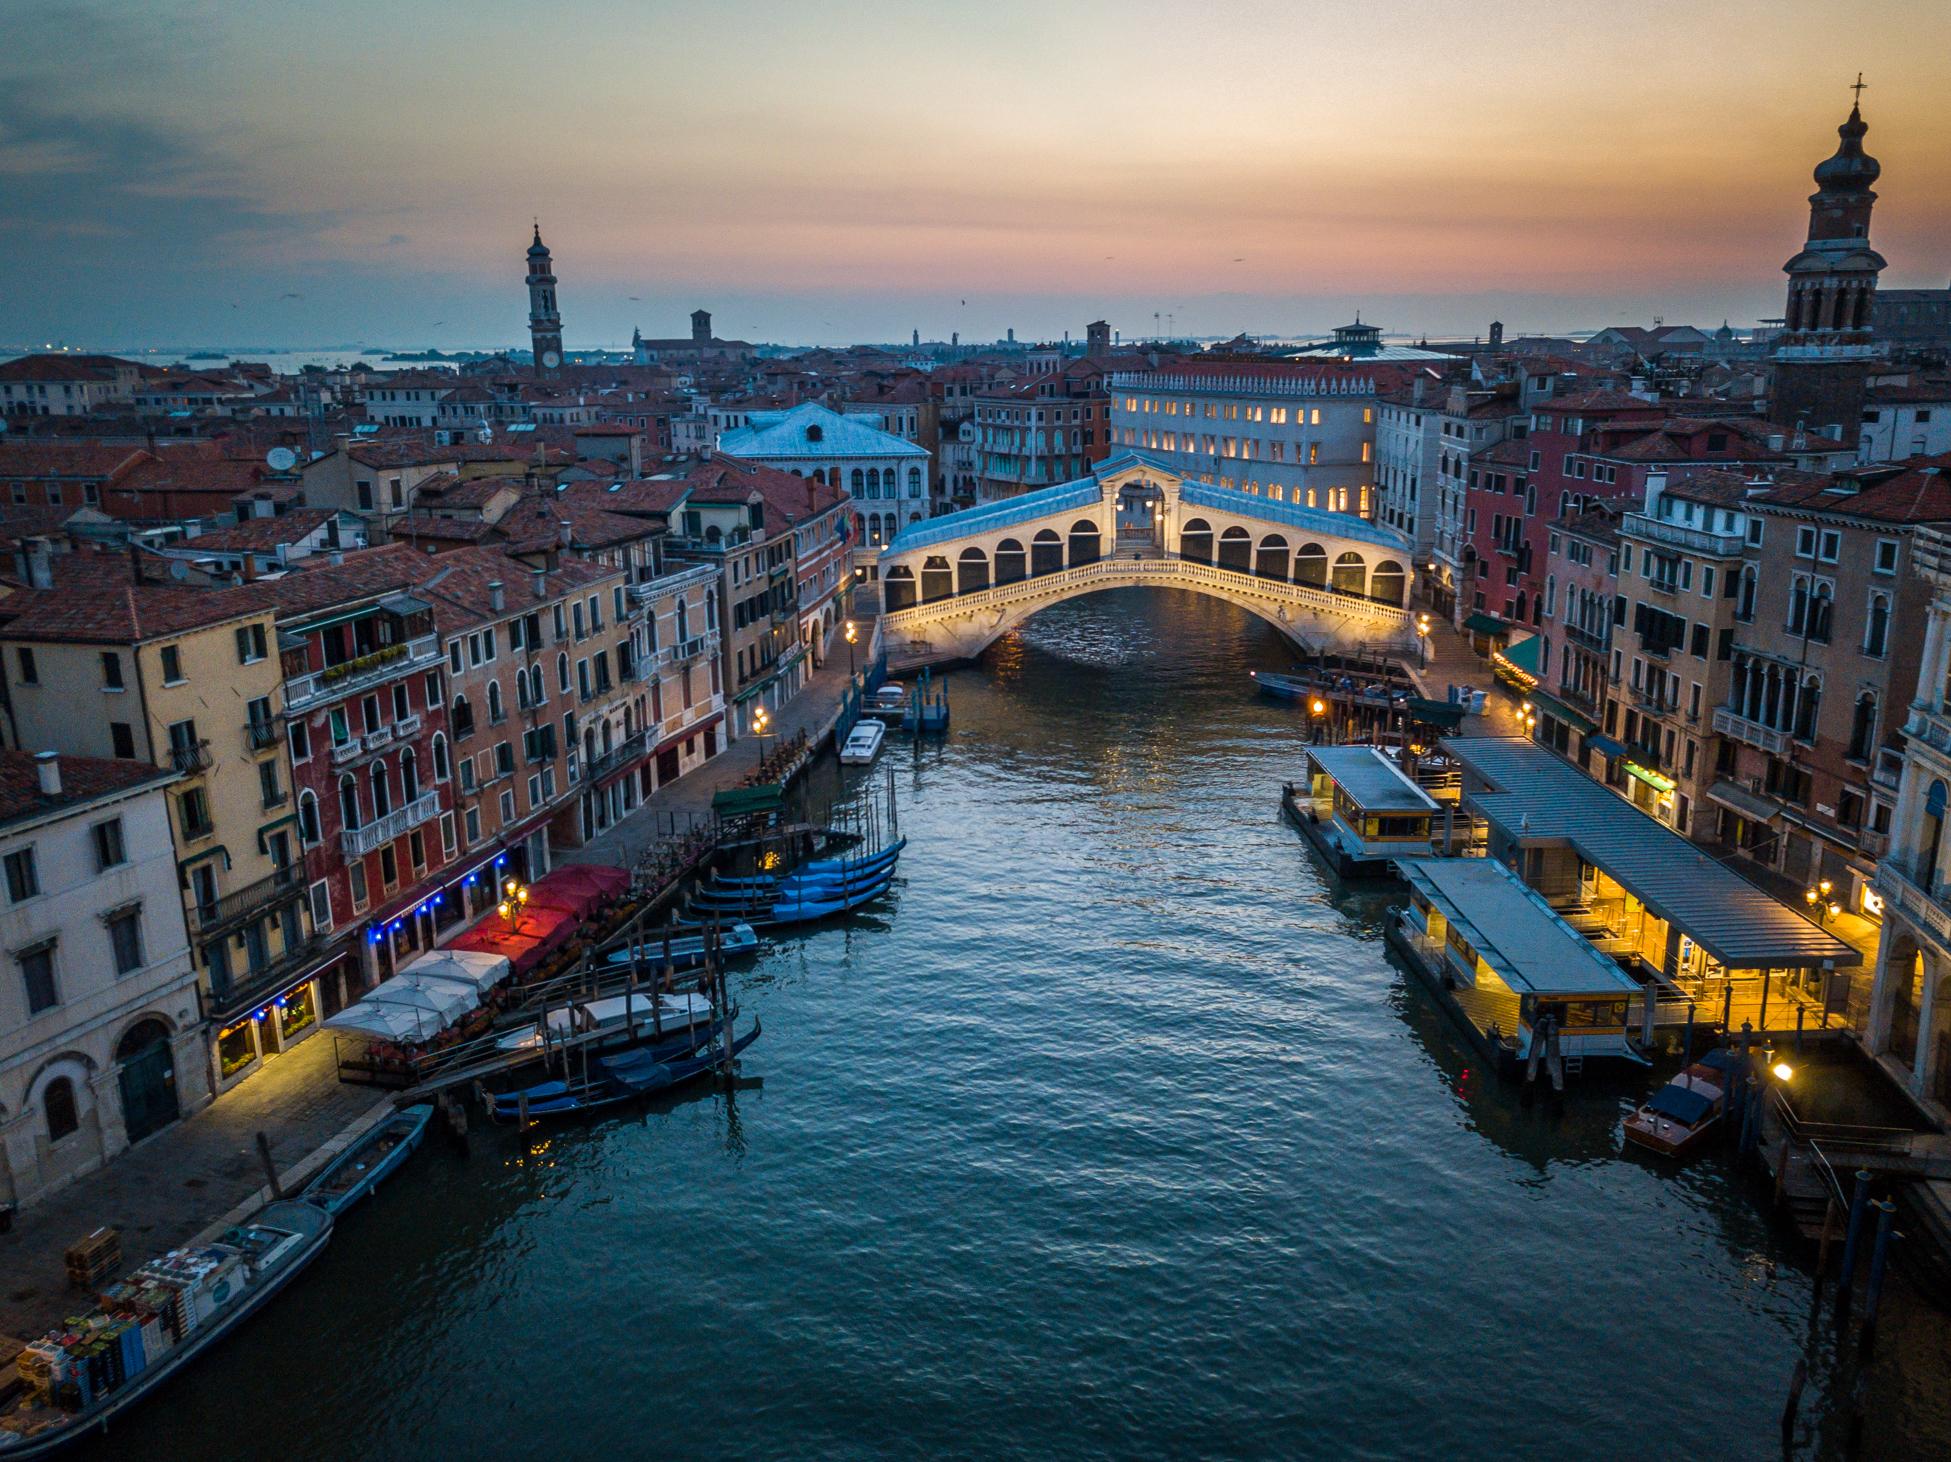 Rialto Bridge - Venice, Italy